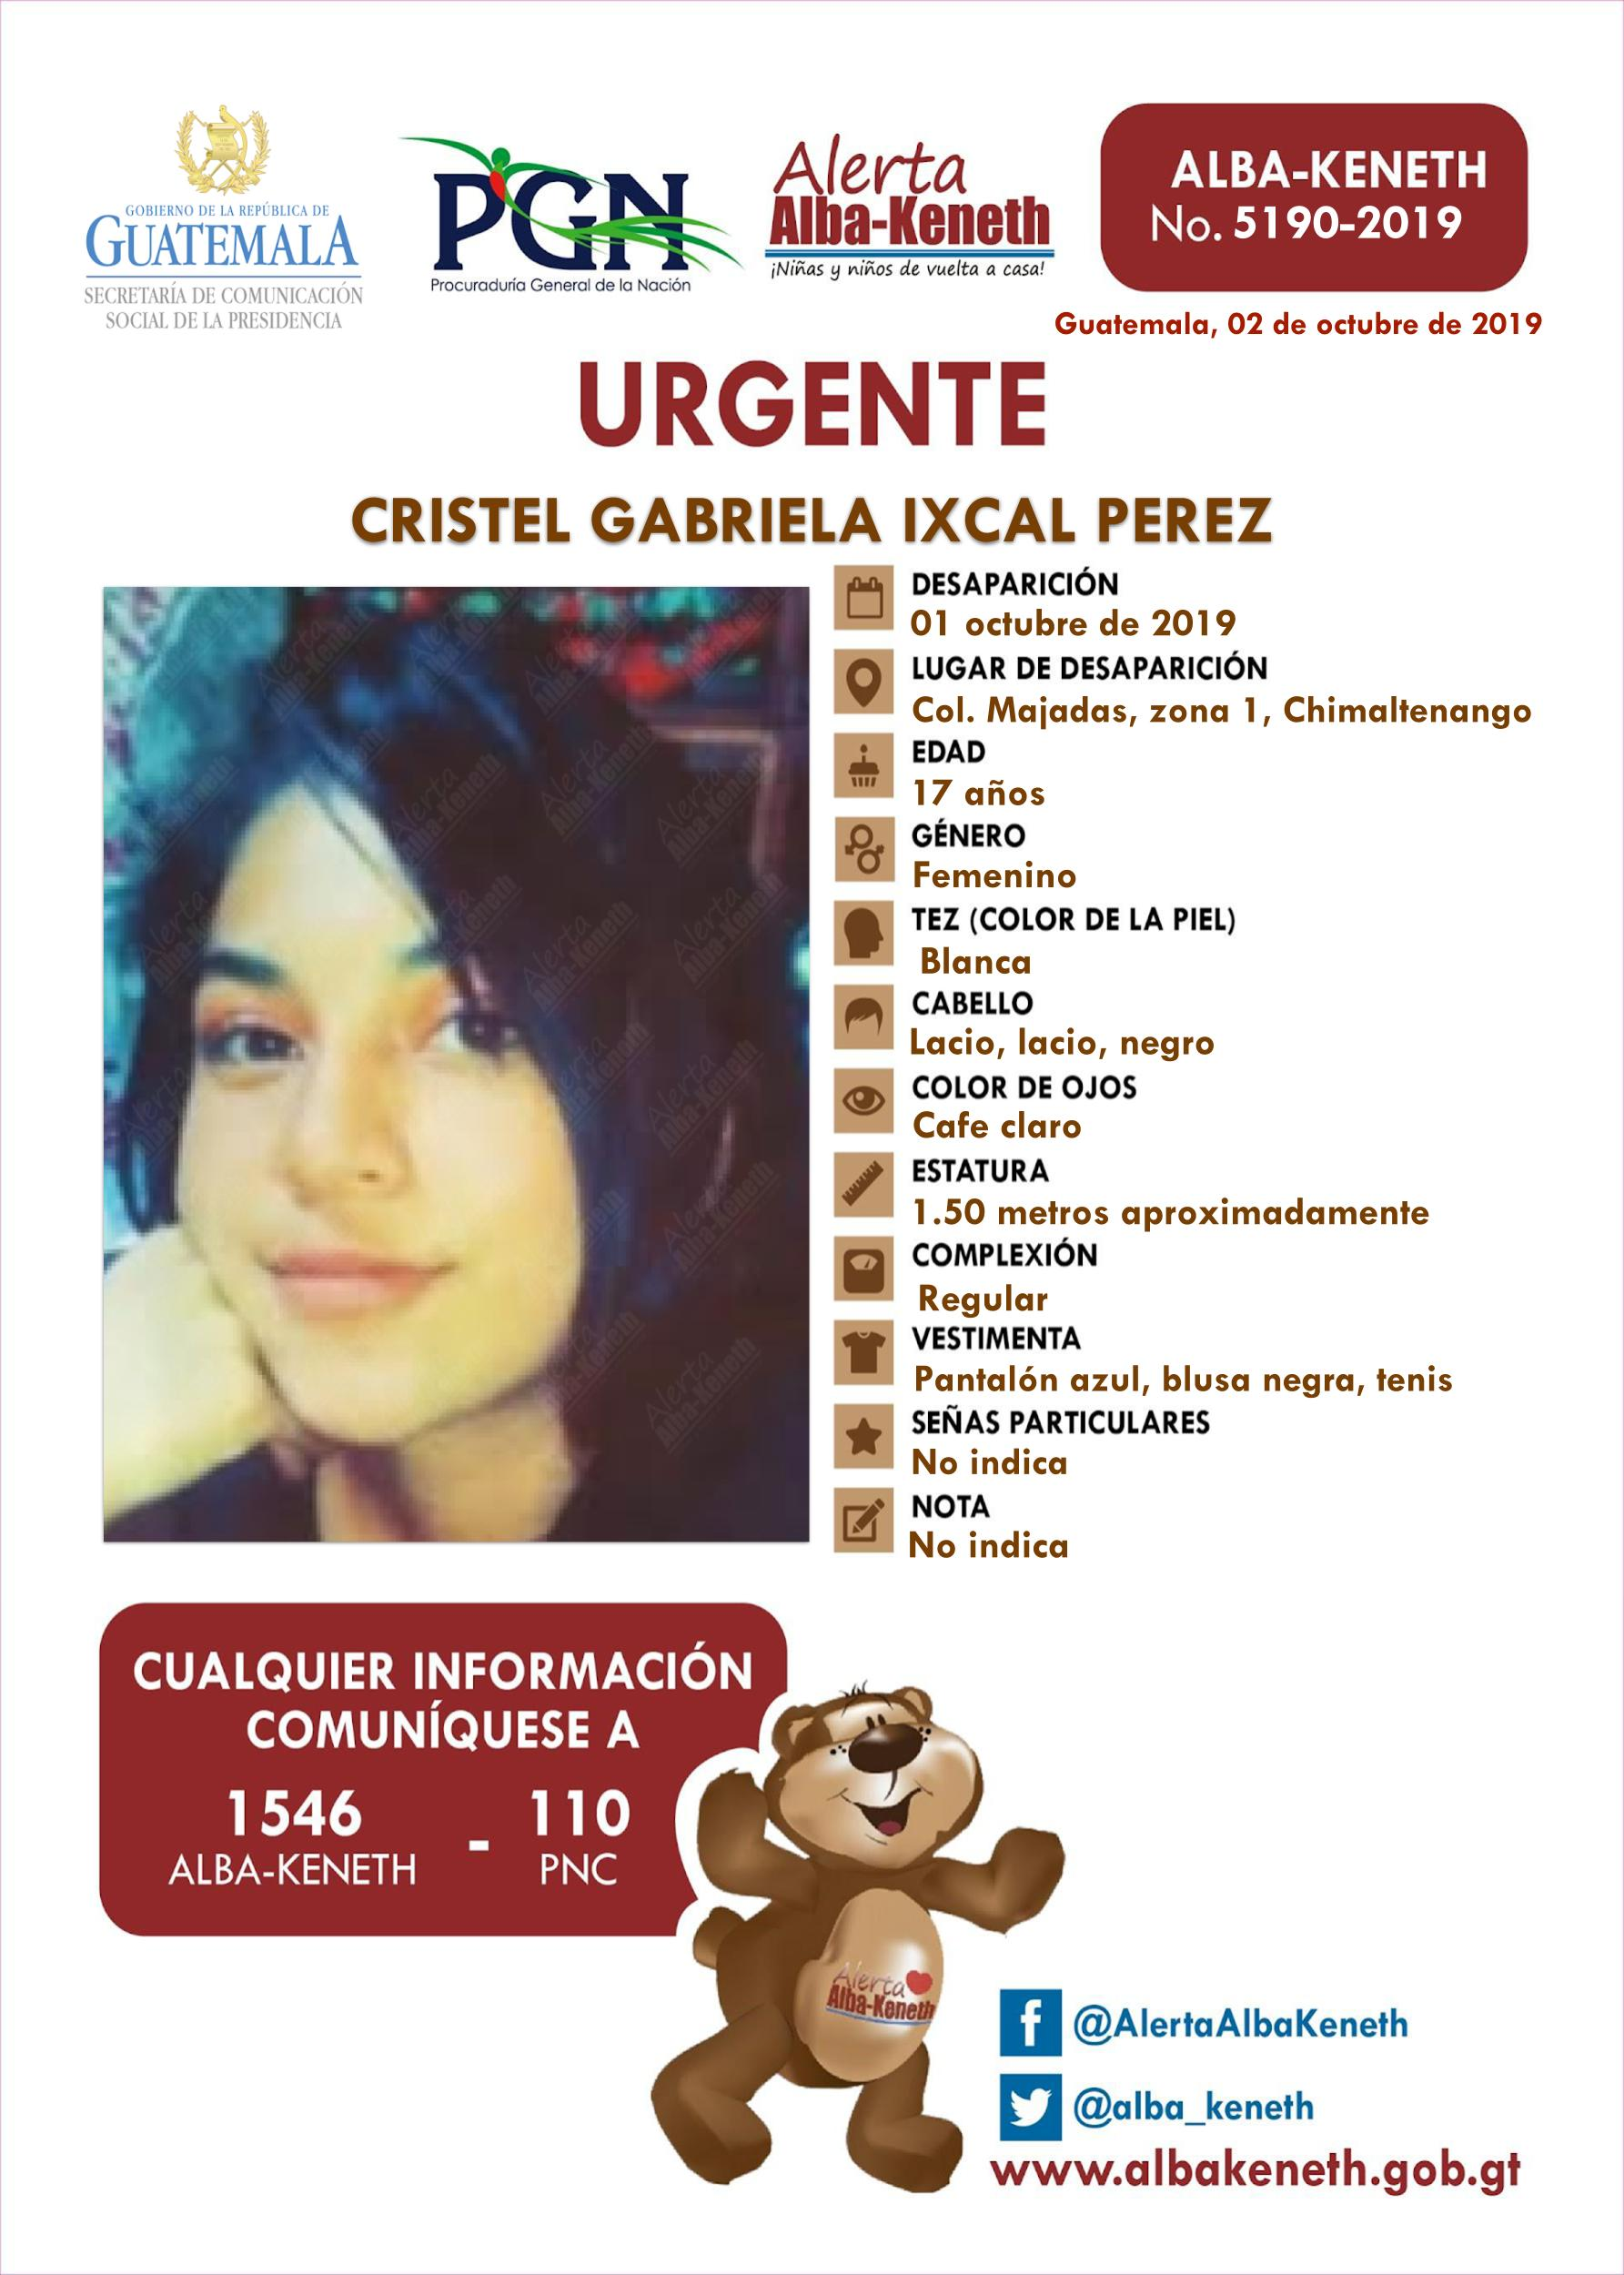 Cristel Gabriela Ixcal Perez